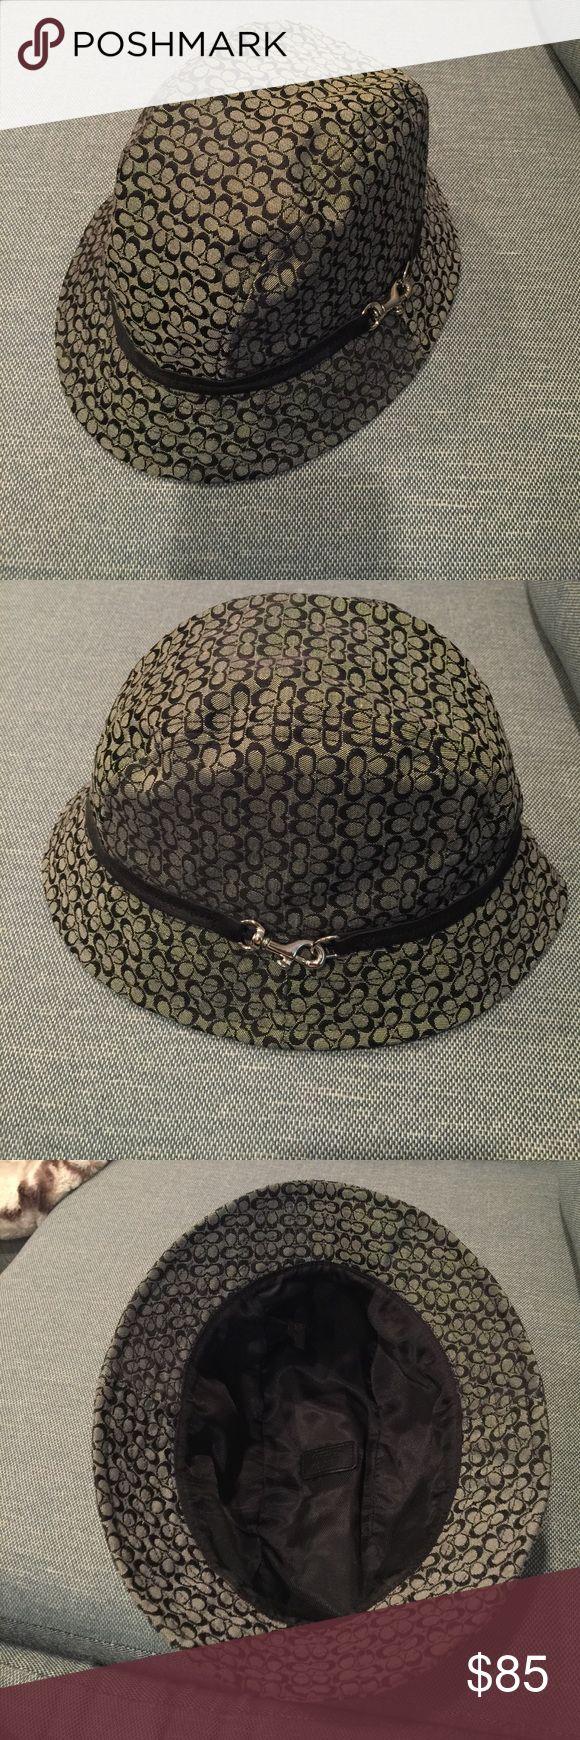 Coach hat Black coach hat with logo c all over it size M/L Coach Accessories Hats